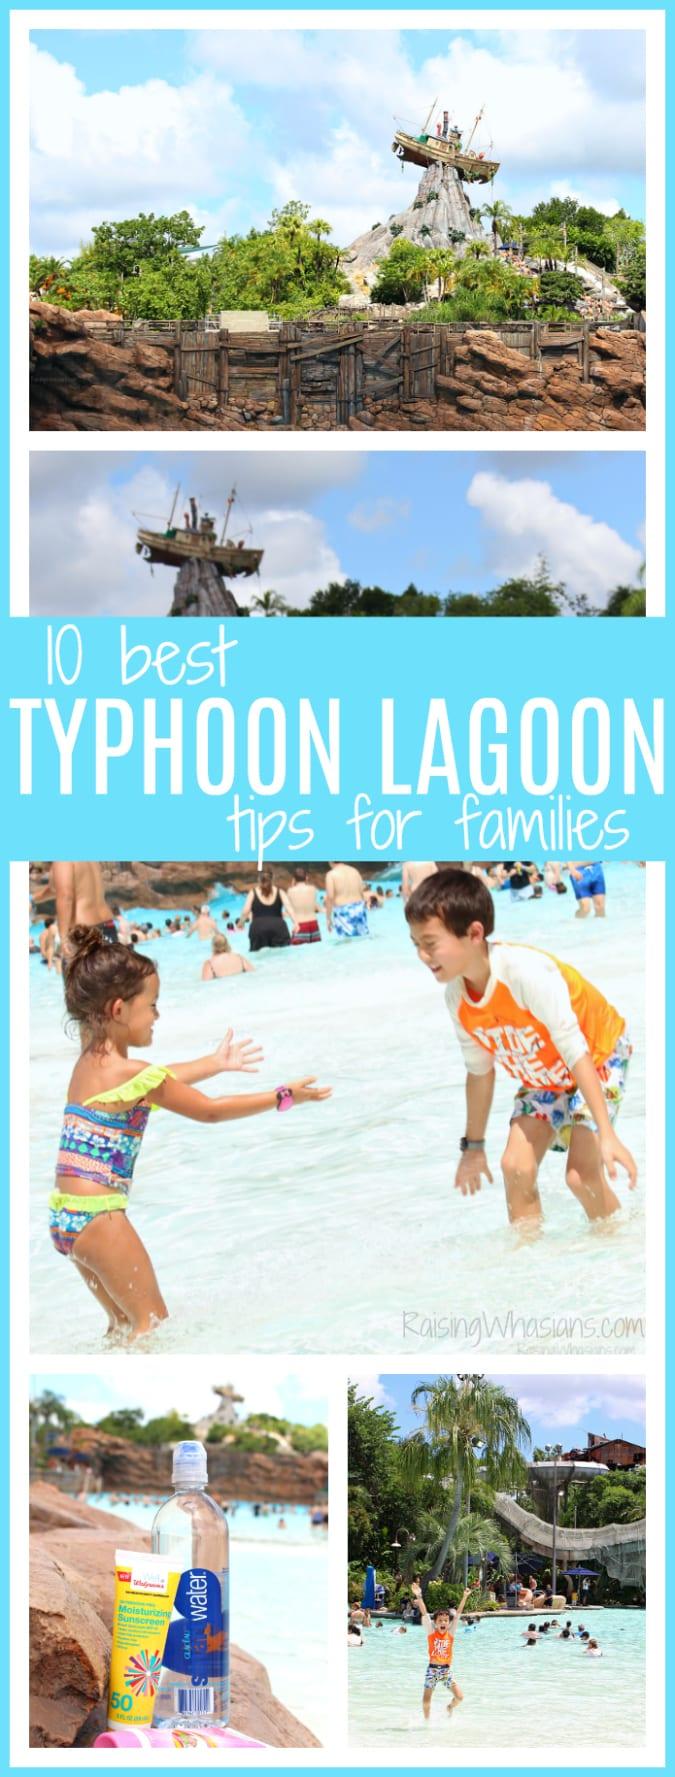 Best typhoon lagoon tips for families